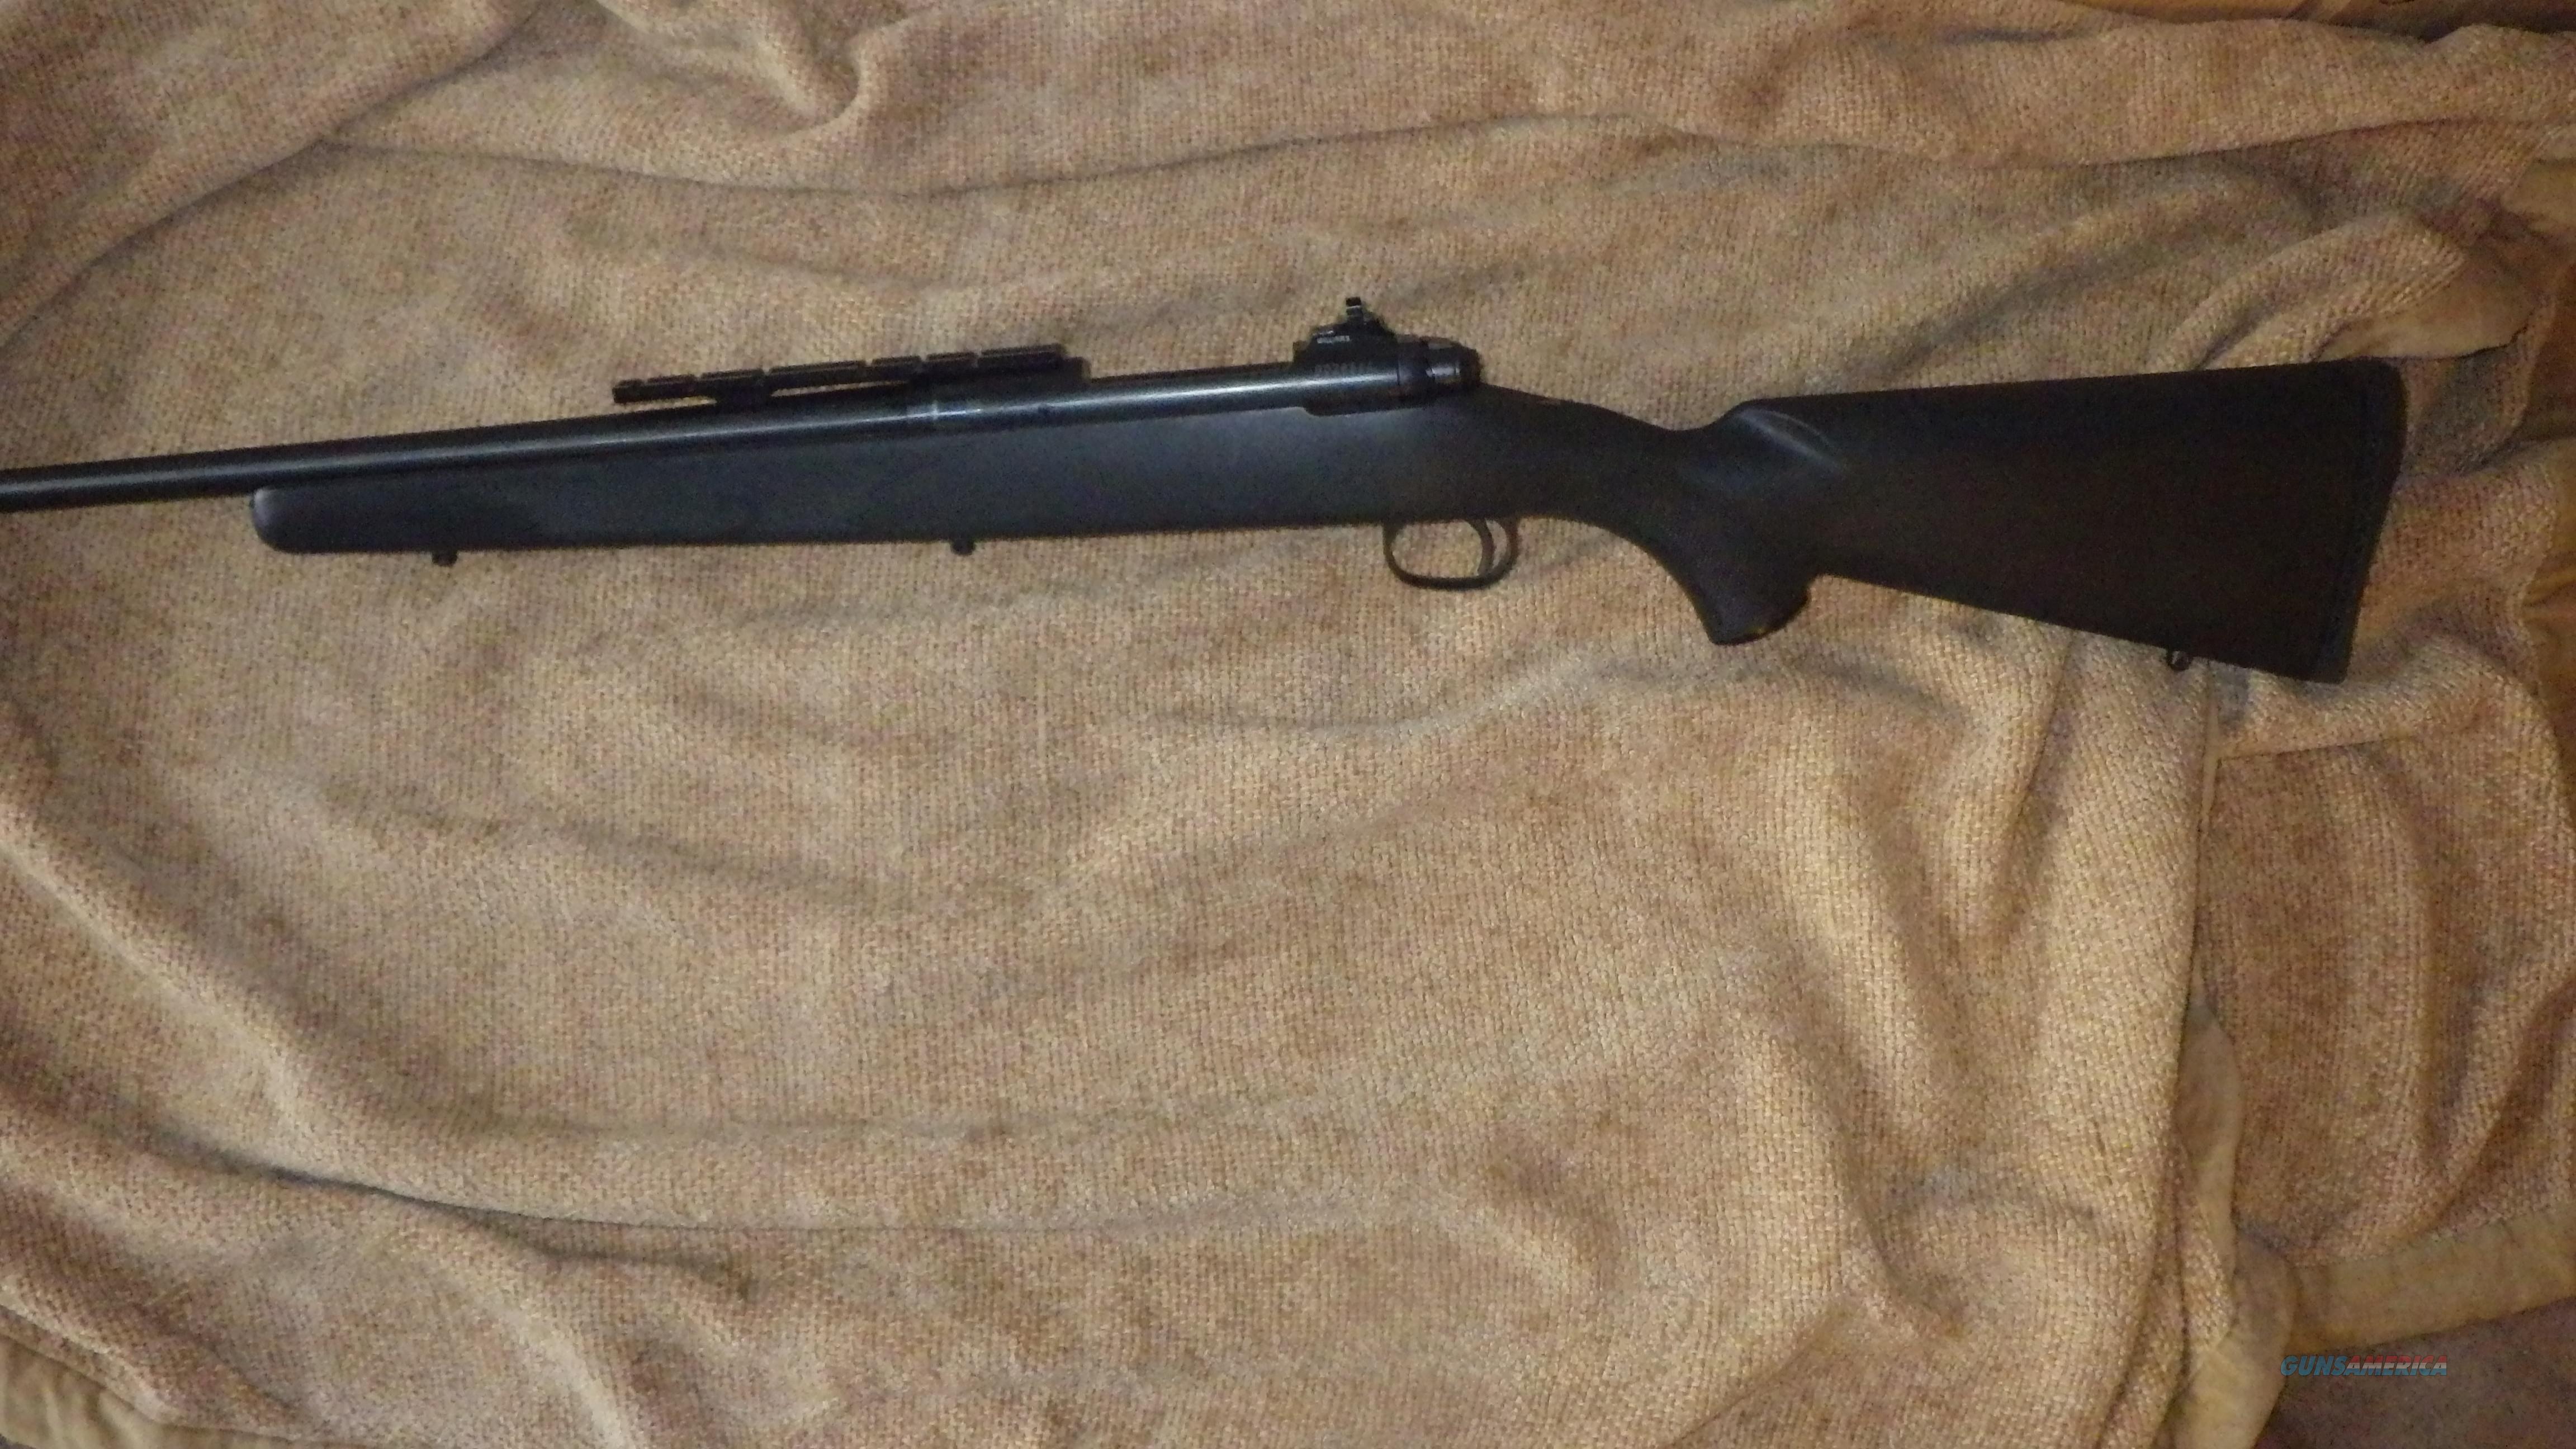 Savage Mod 10 Scout .308 rifle   Guns > Rifles > Savage Rifles > 10/110